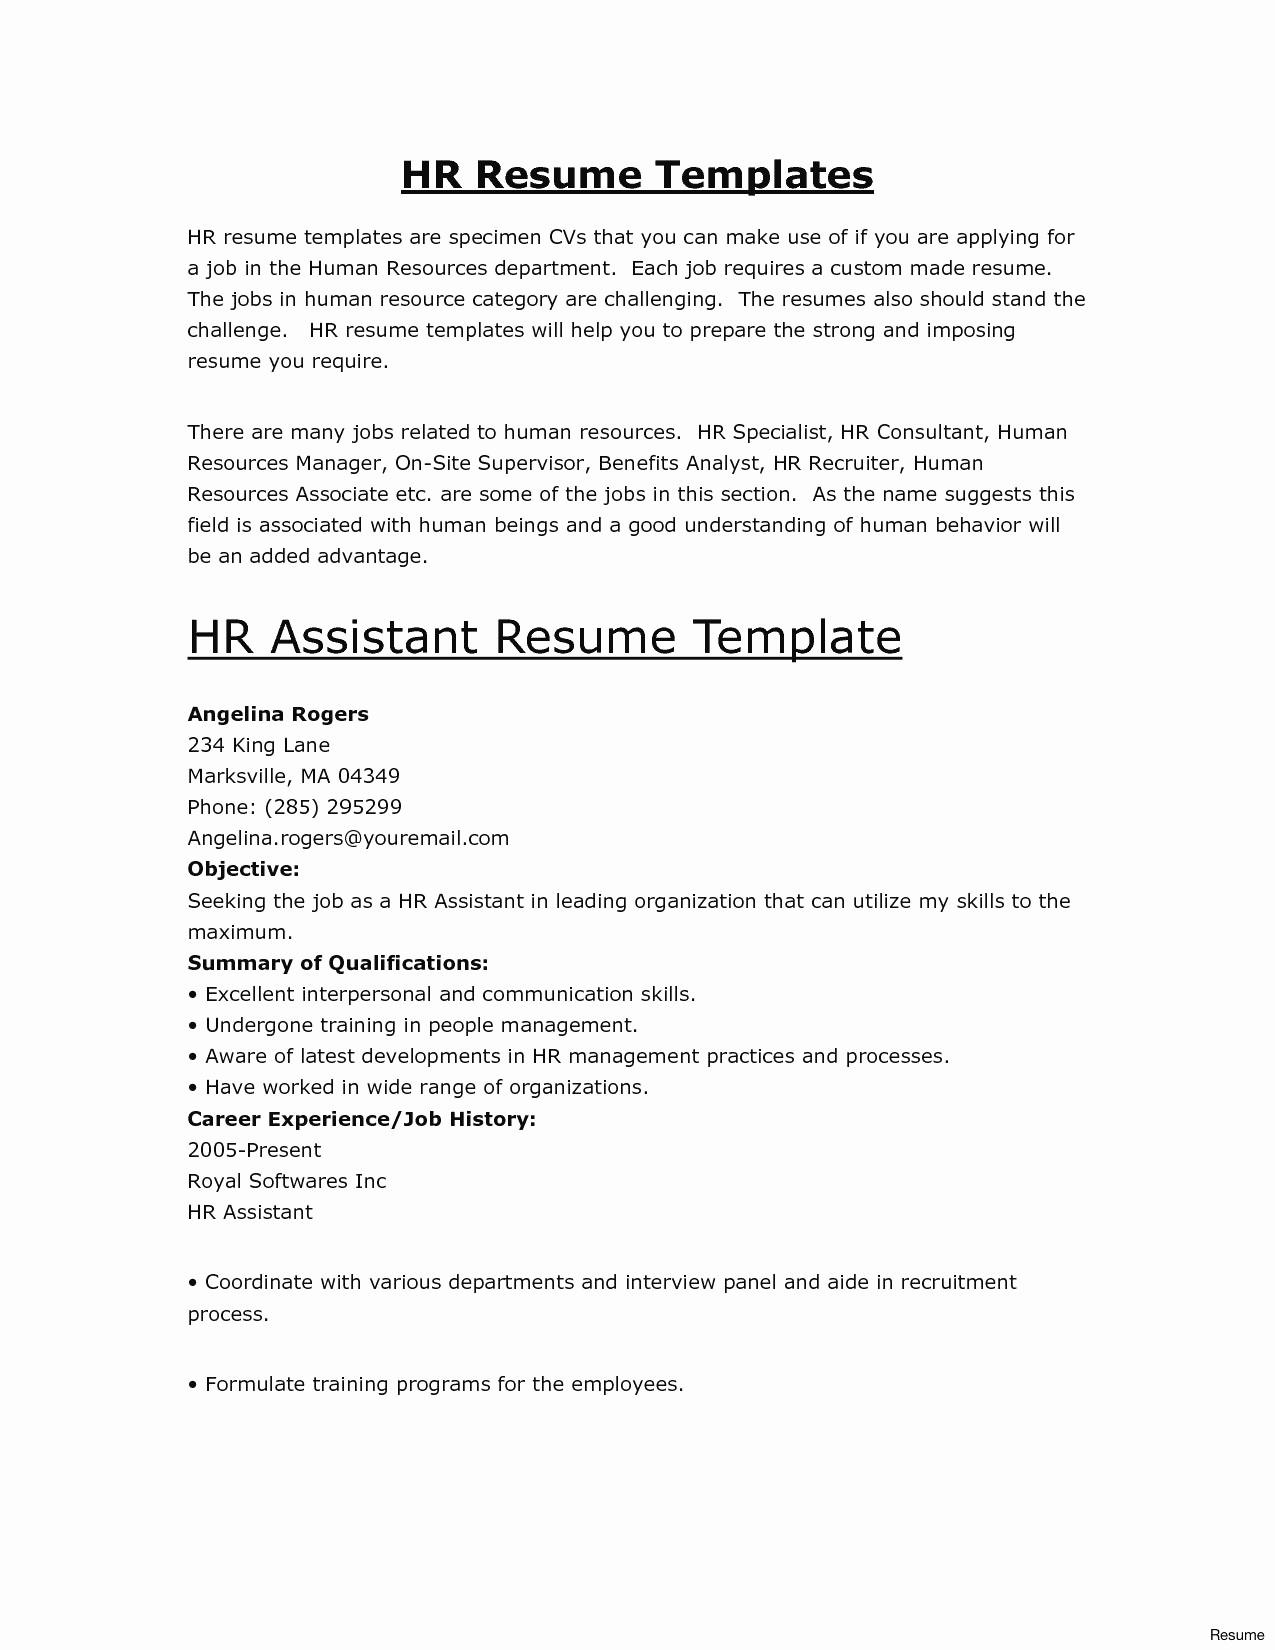 Verification Letter Template - Inspirational Employment Verification Letter Template